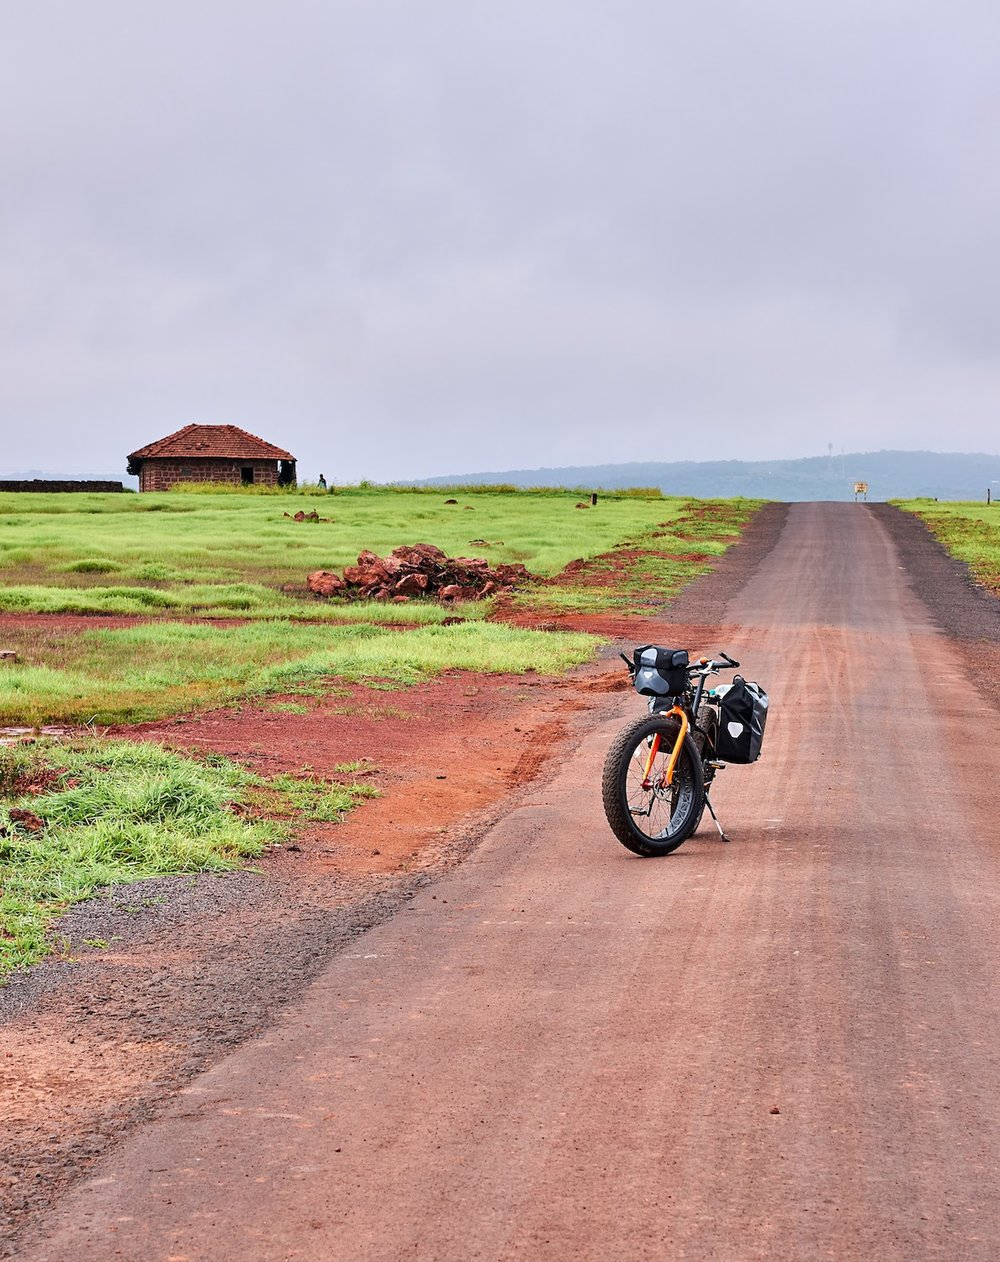 Goa on a fatbike bikepacking mumbai goa india.jpg